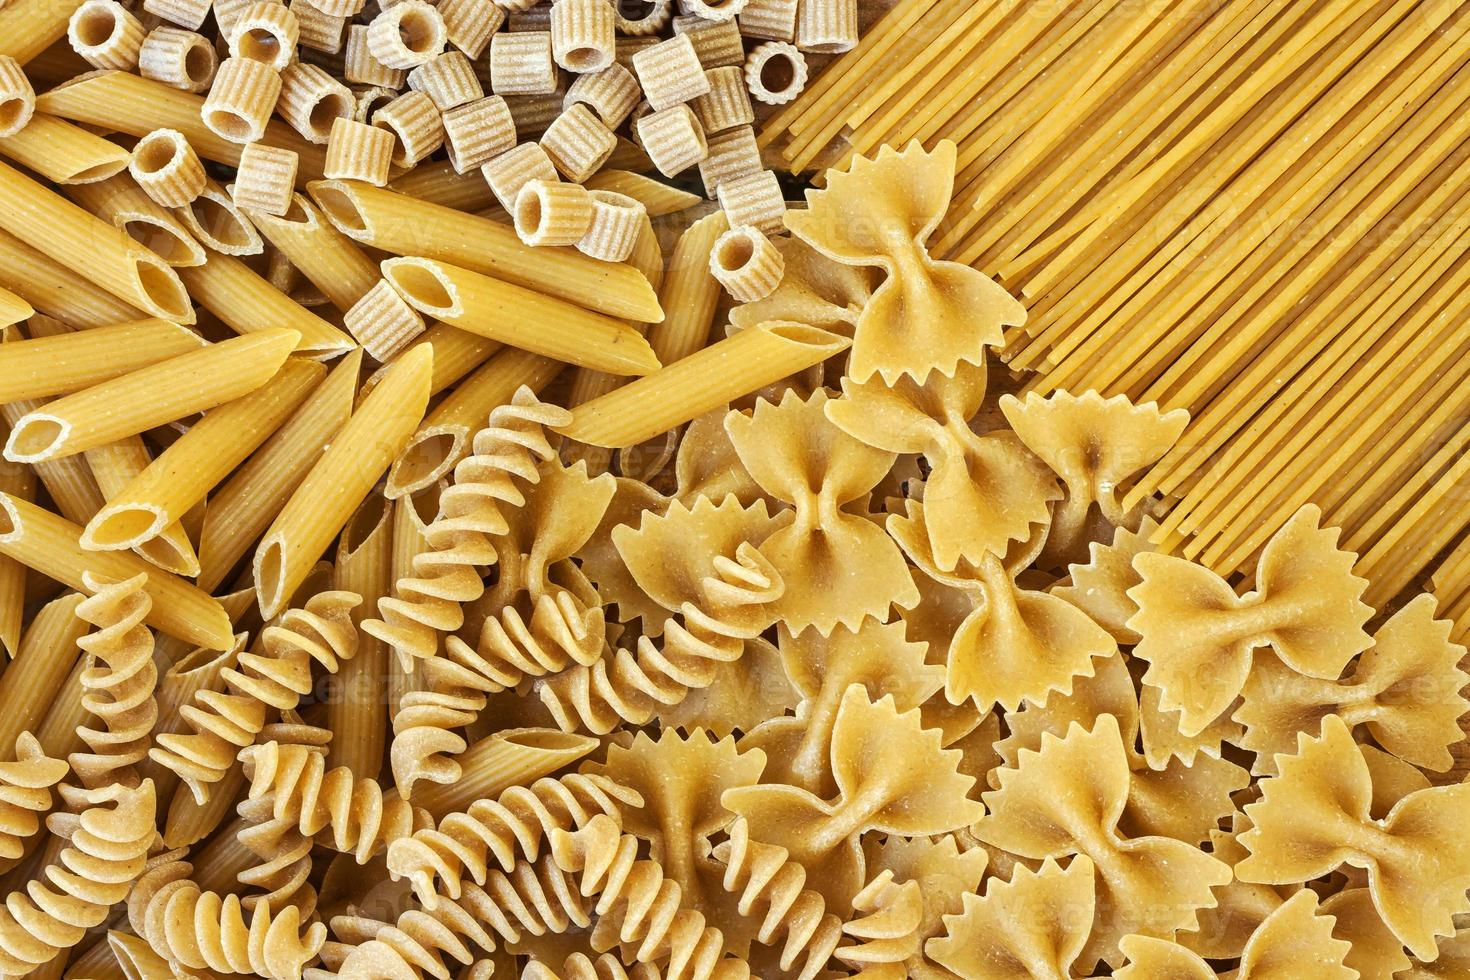 Integrals pasta - texture photo